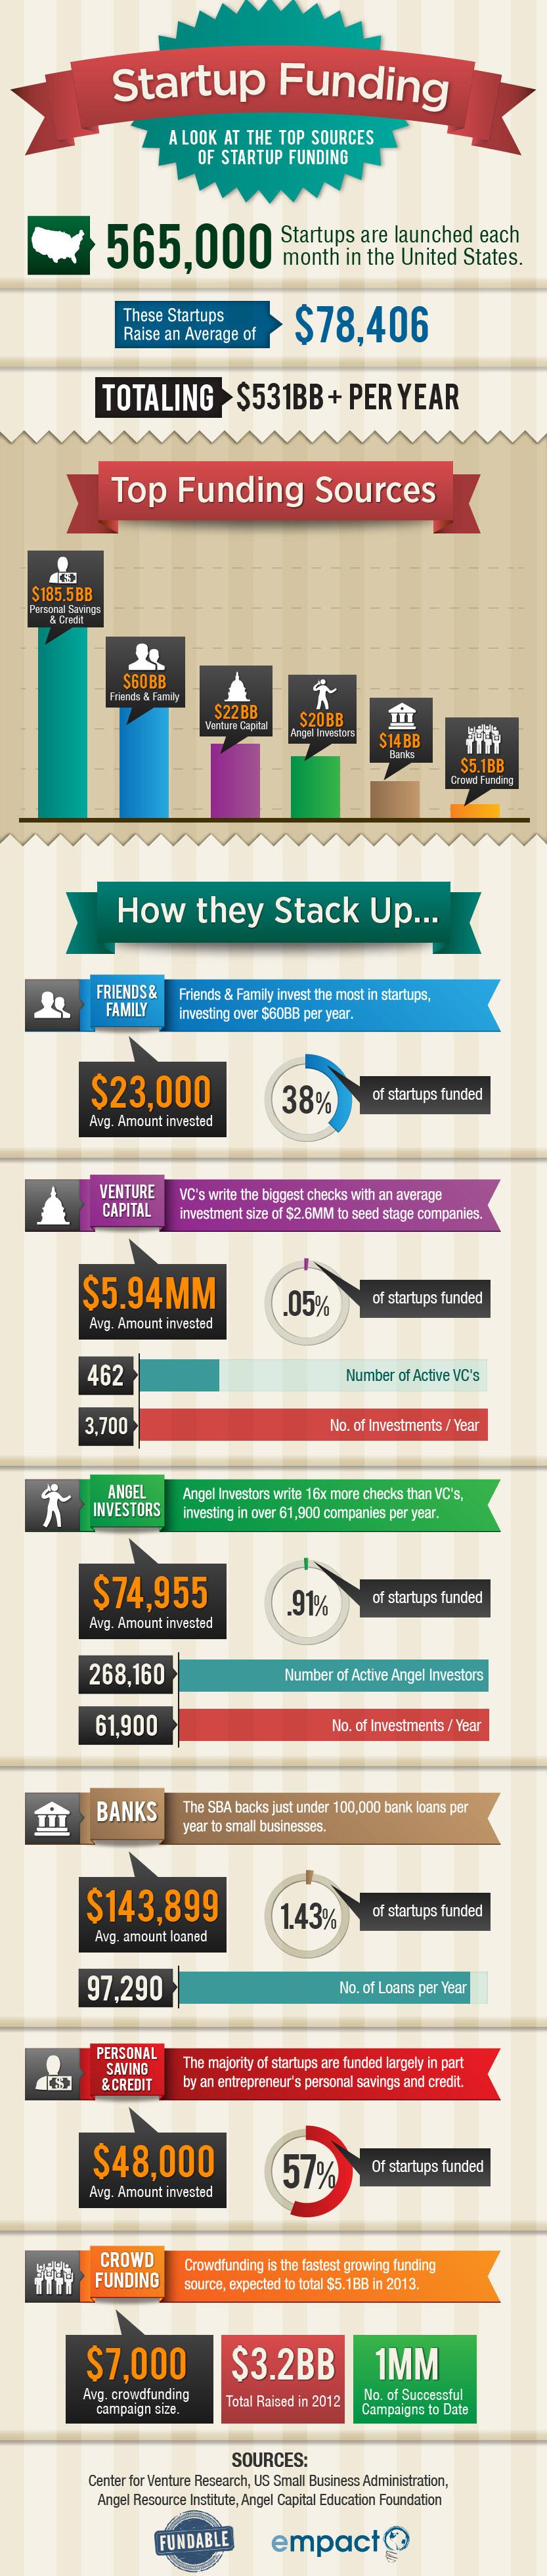 startups-capital-semilla